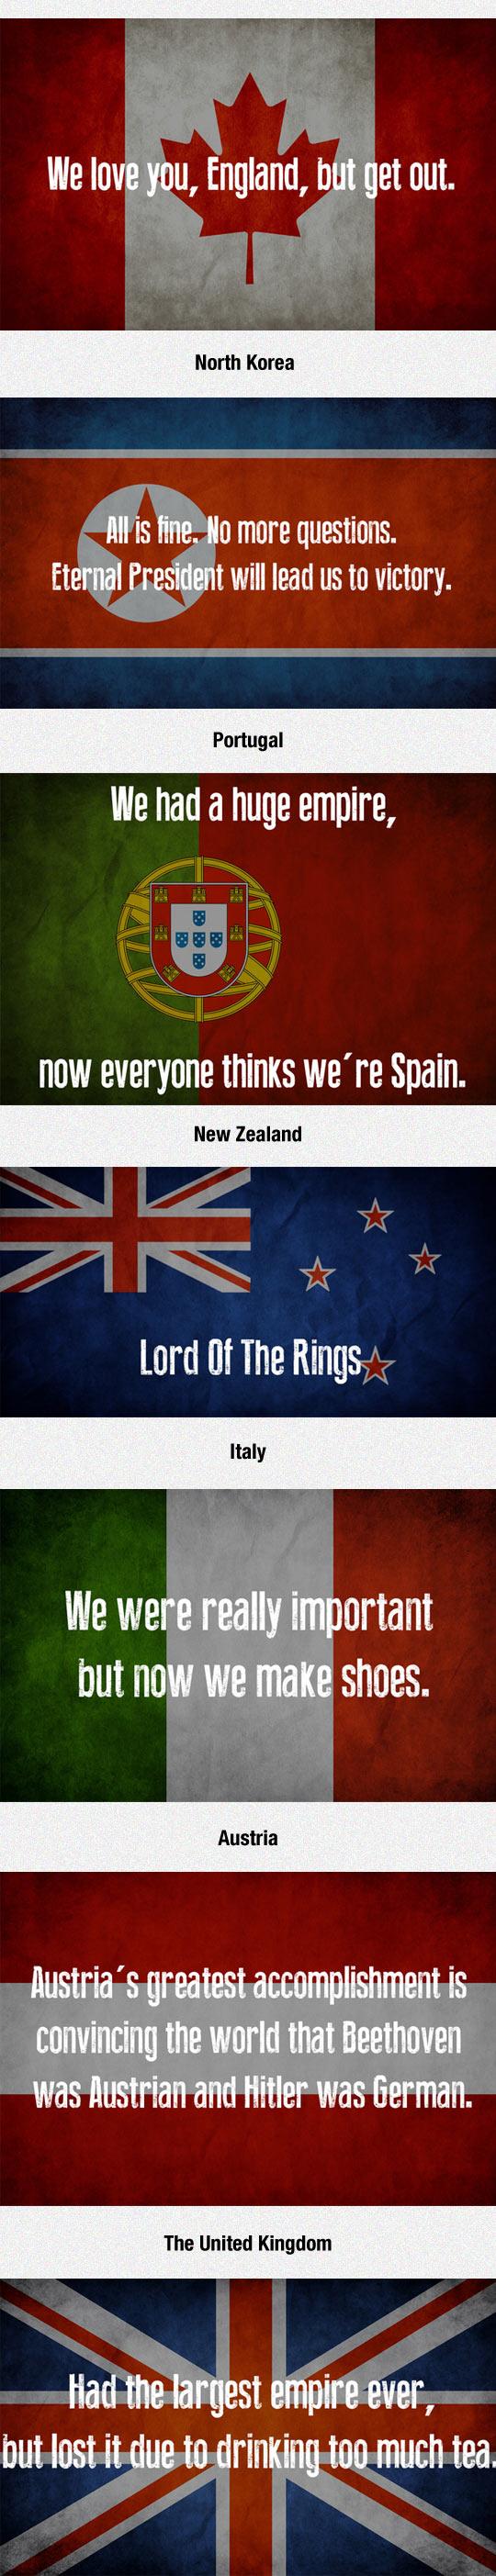 funny-flag-history-slogan-countries-Korea